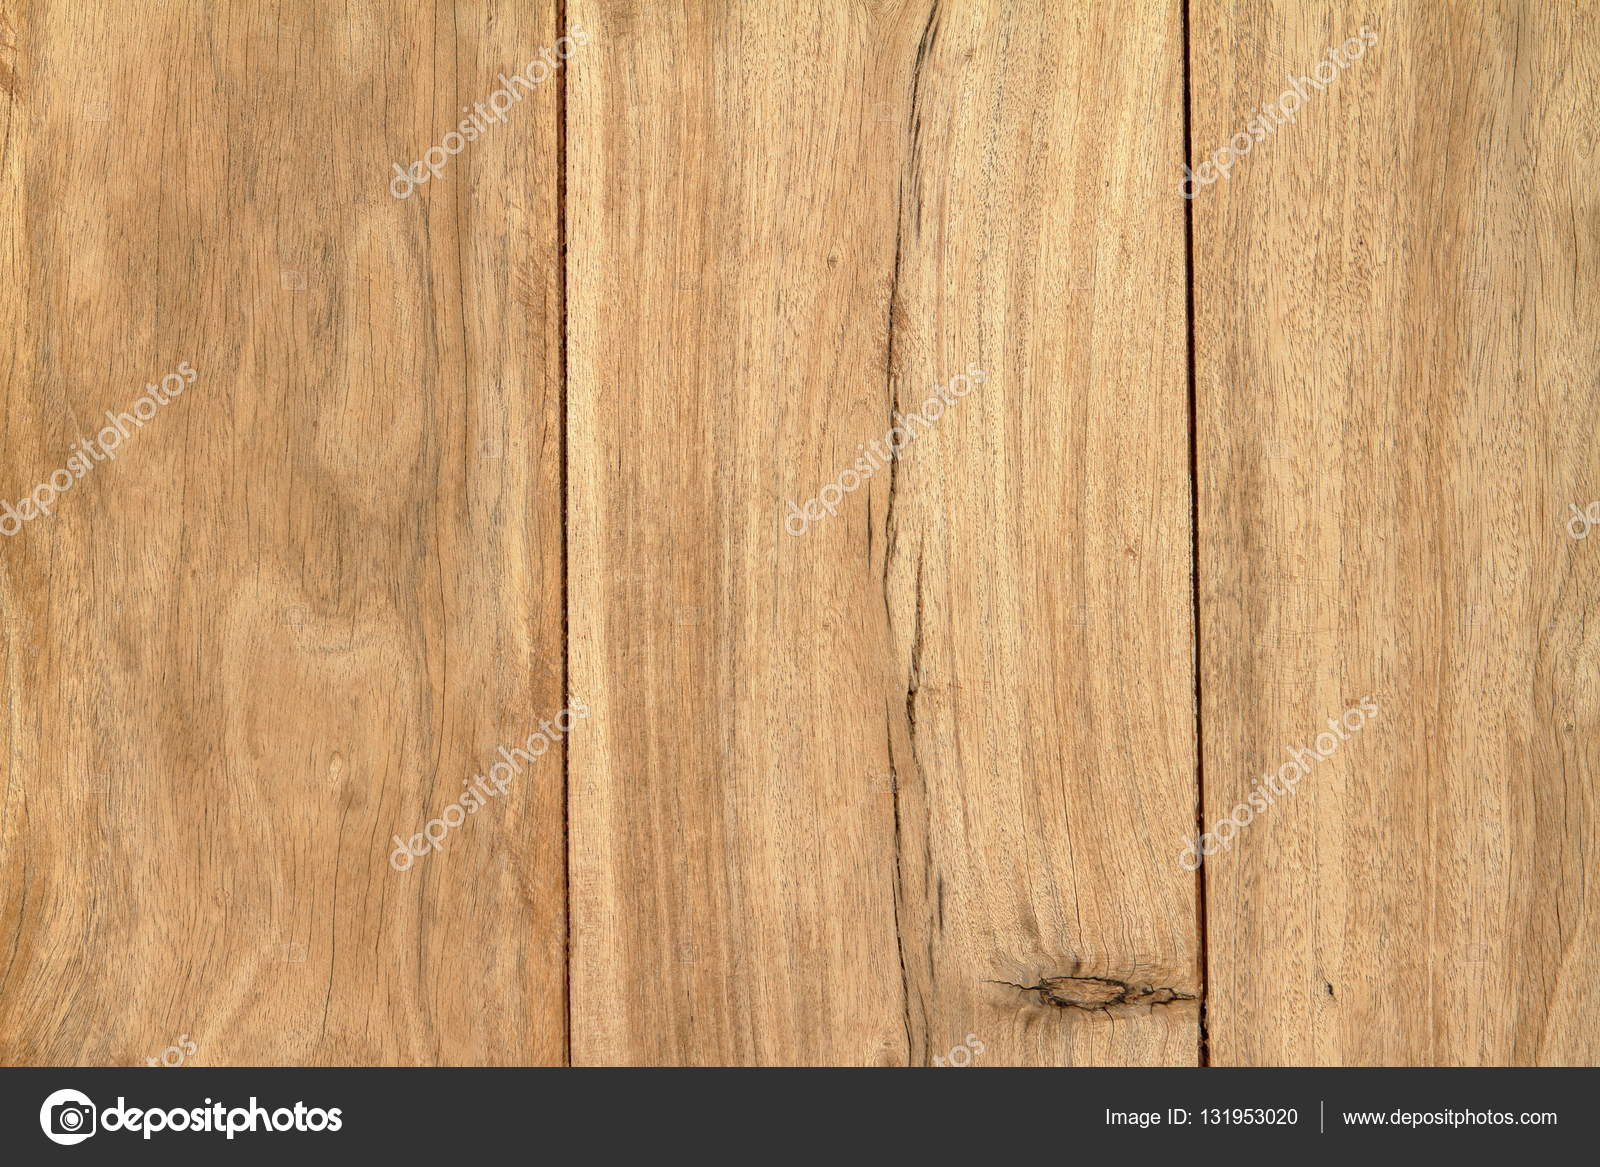 rustikale holz-hintergrund — stockfoto © hecke06 #131953020